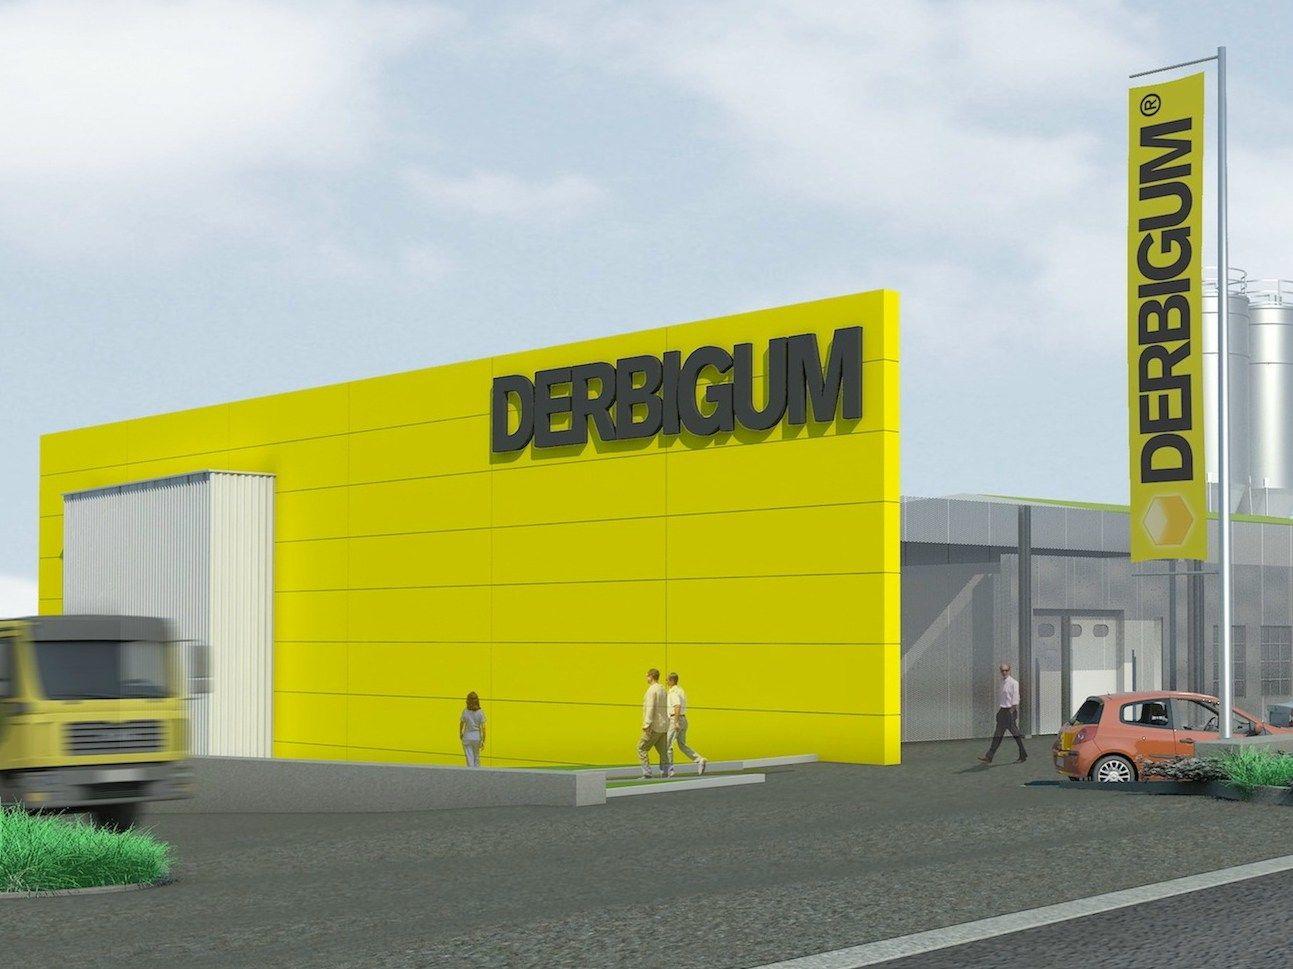 Si rinnova la sede del gruppo Derbigum a Lot, in Belgio